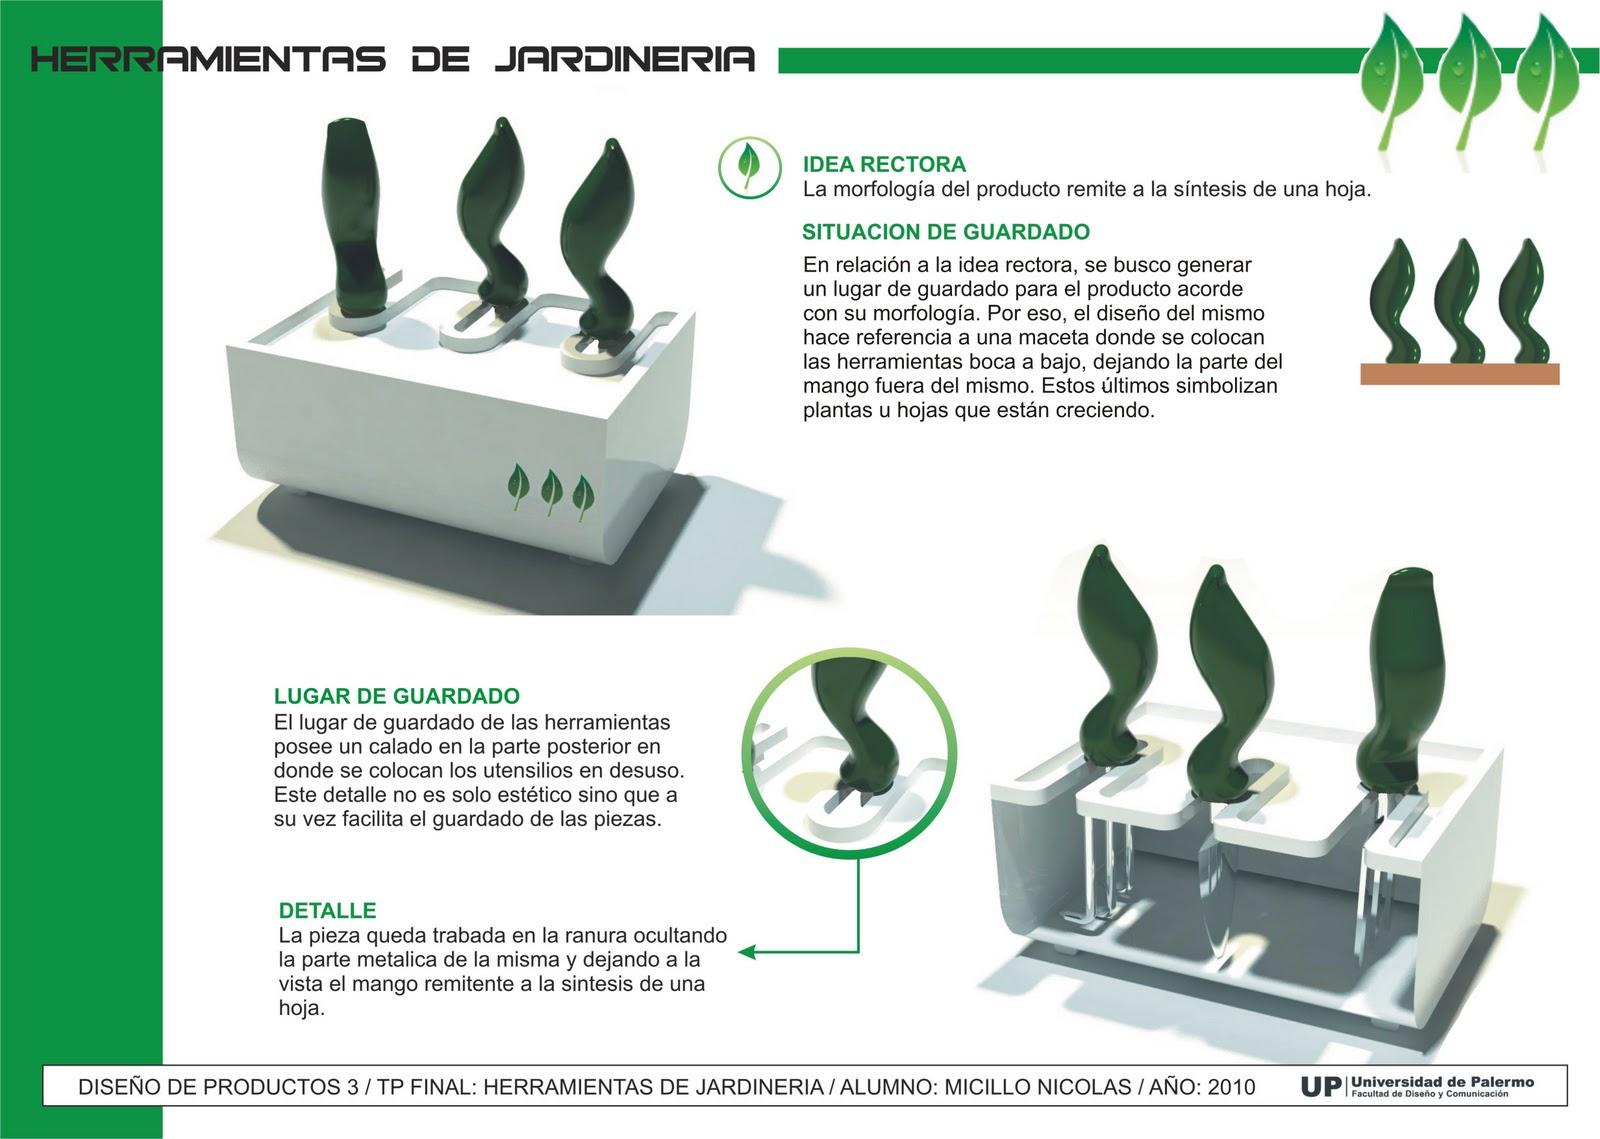 Herramientas de jardineria - Herramientas de jardineria 94 ...